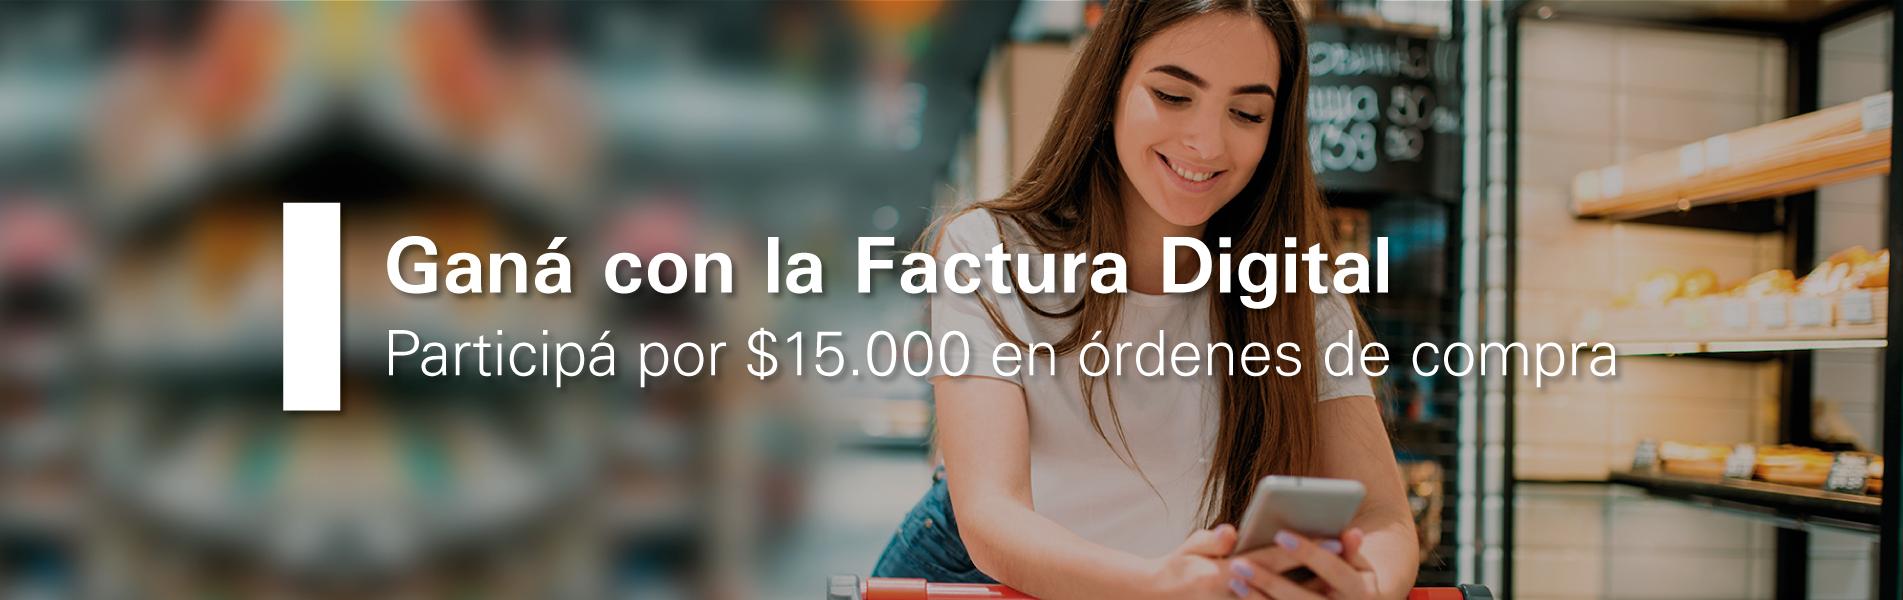 Promo Factura Digital de Edesur